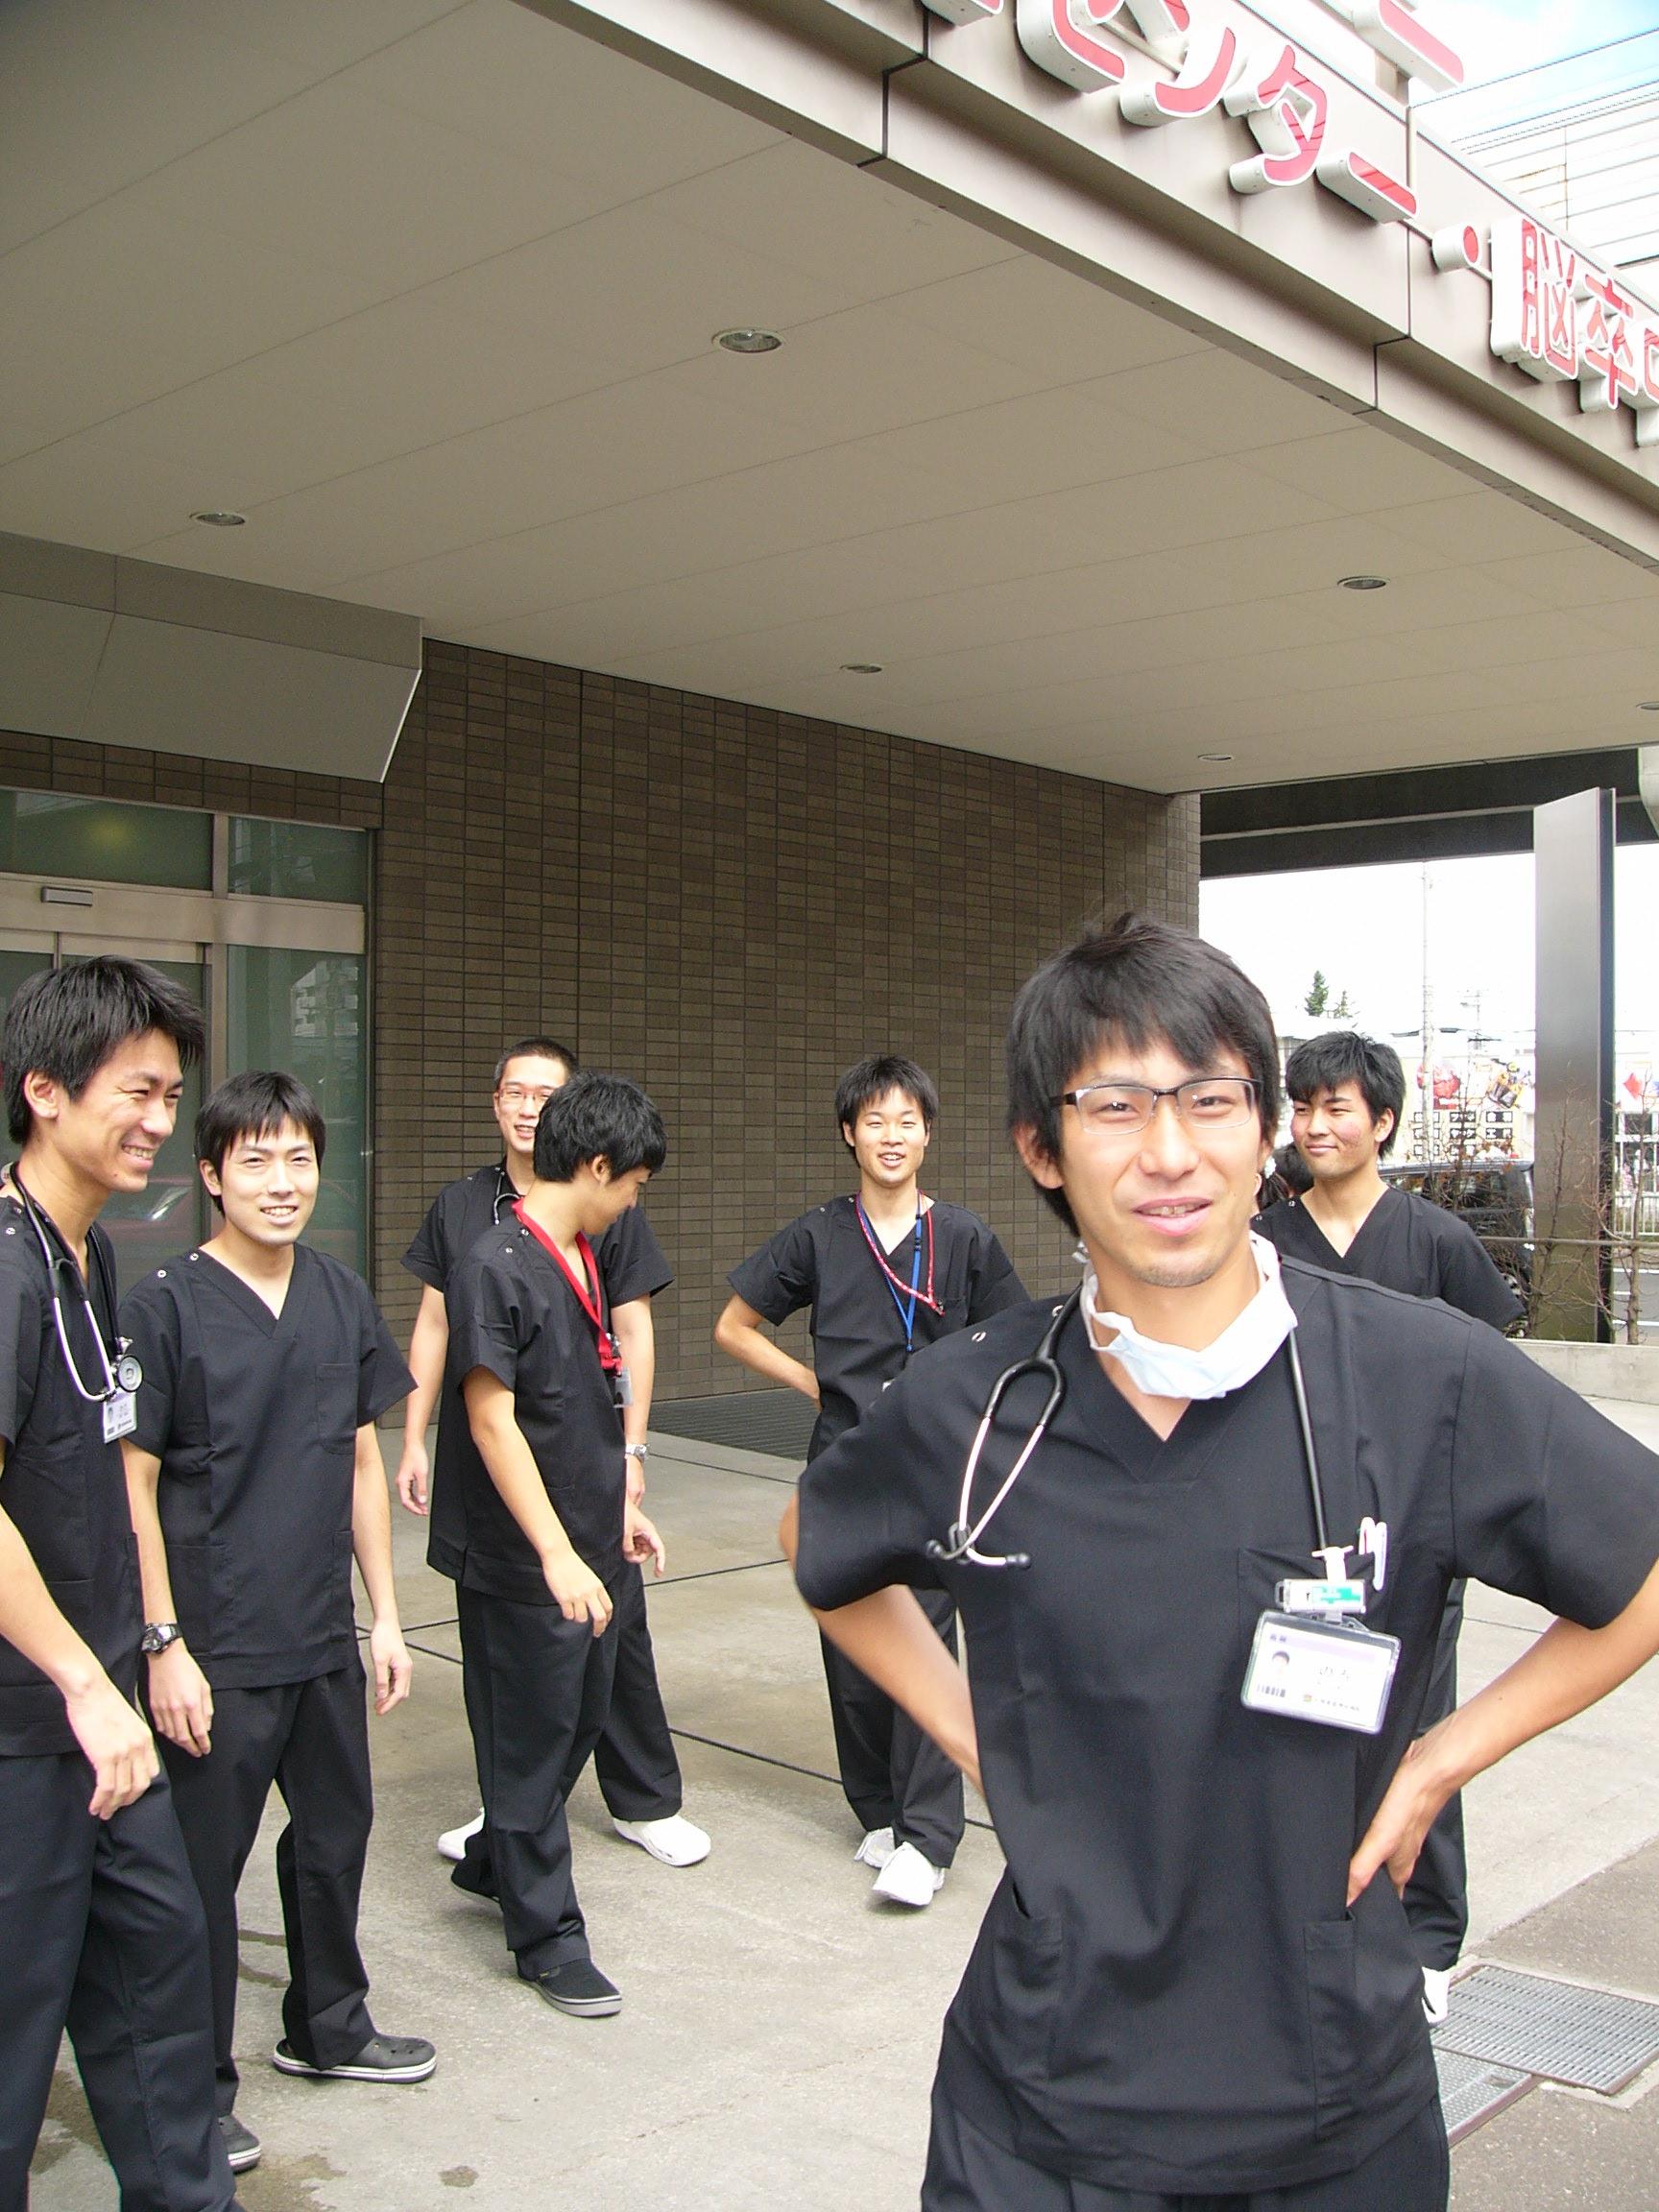 http://blog.higashi-tokushukai.or.jp/ydblog/2013/08/03/%E5%86%99%E7%9C%9F%20%281%29.JPG